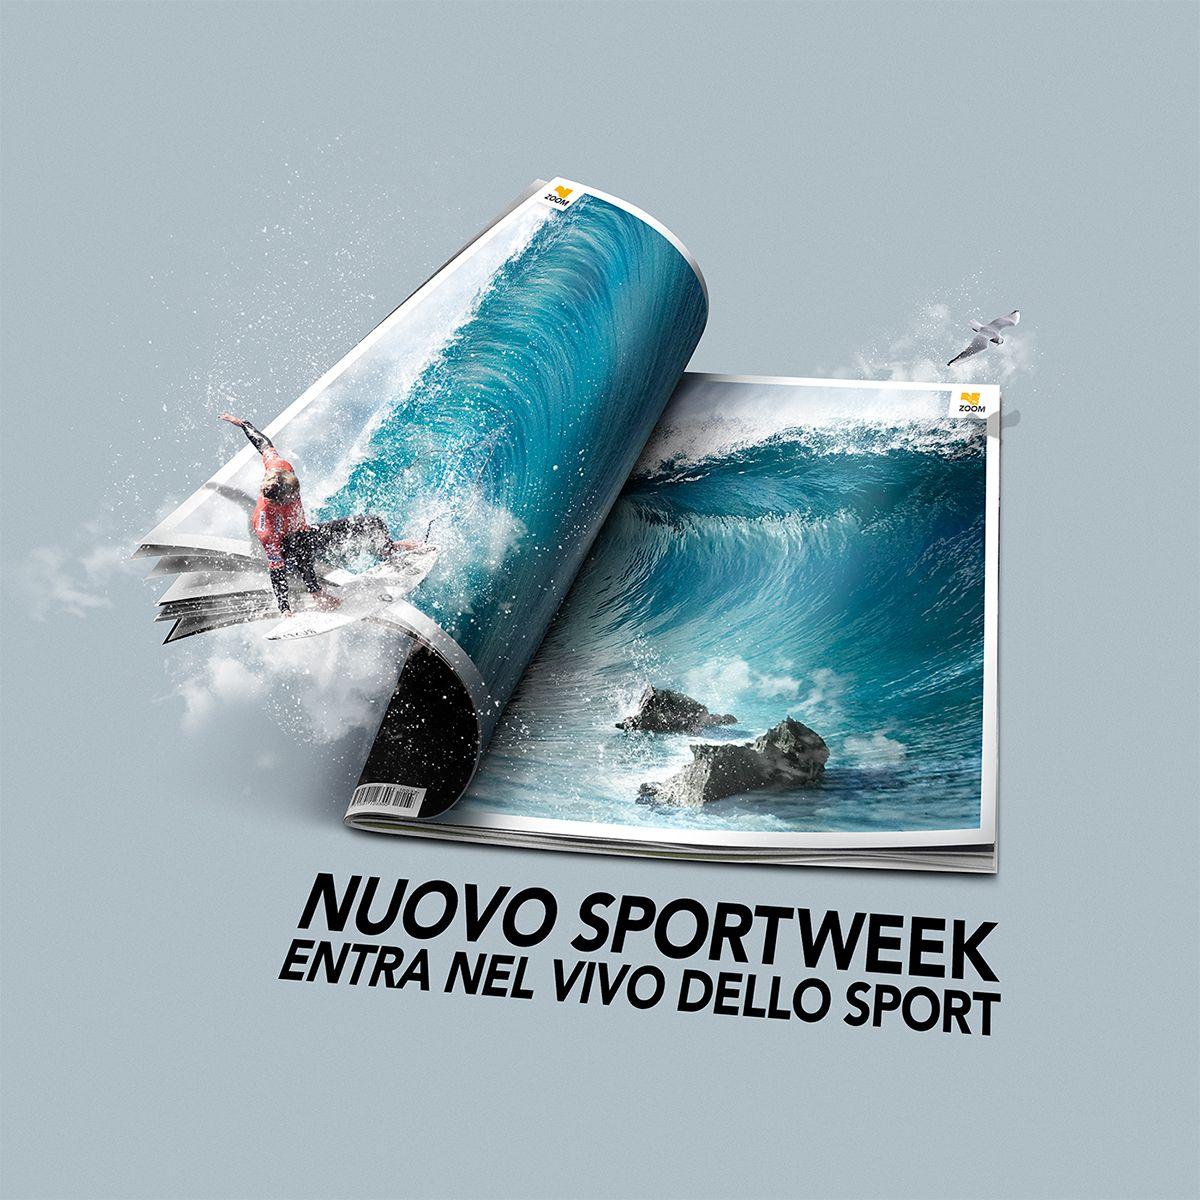 Sport week La Gazzetta dello Sport outdoor